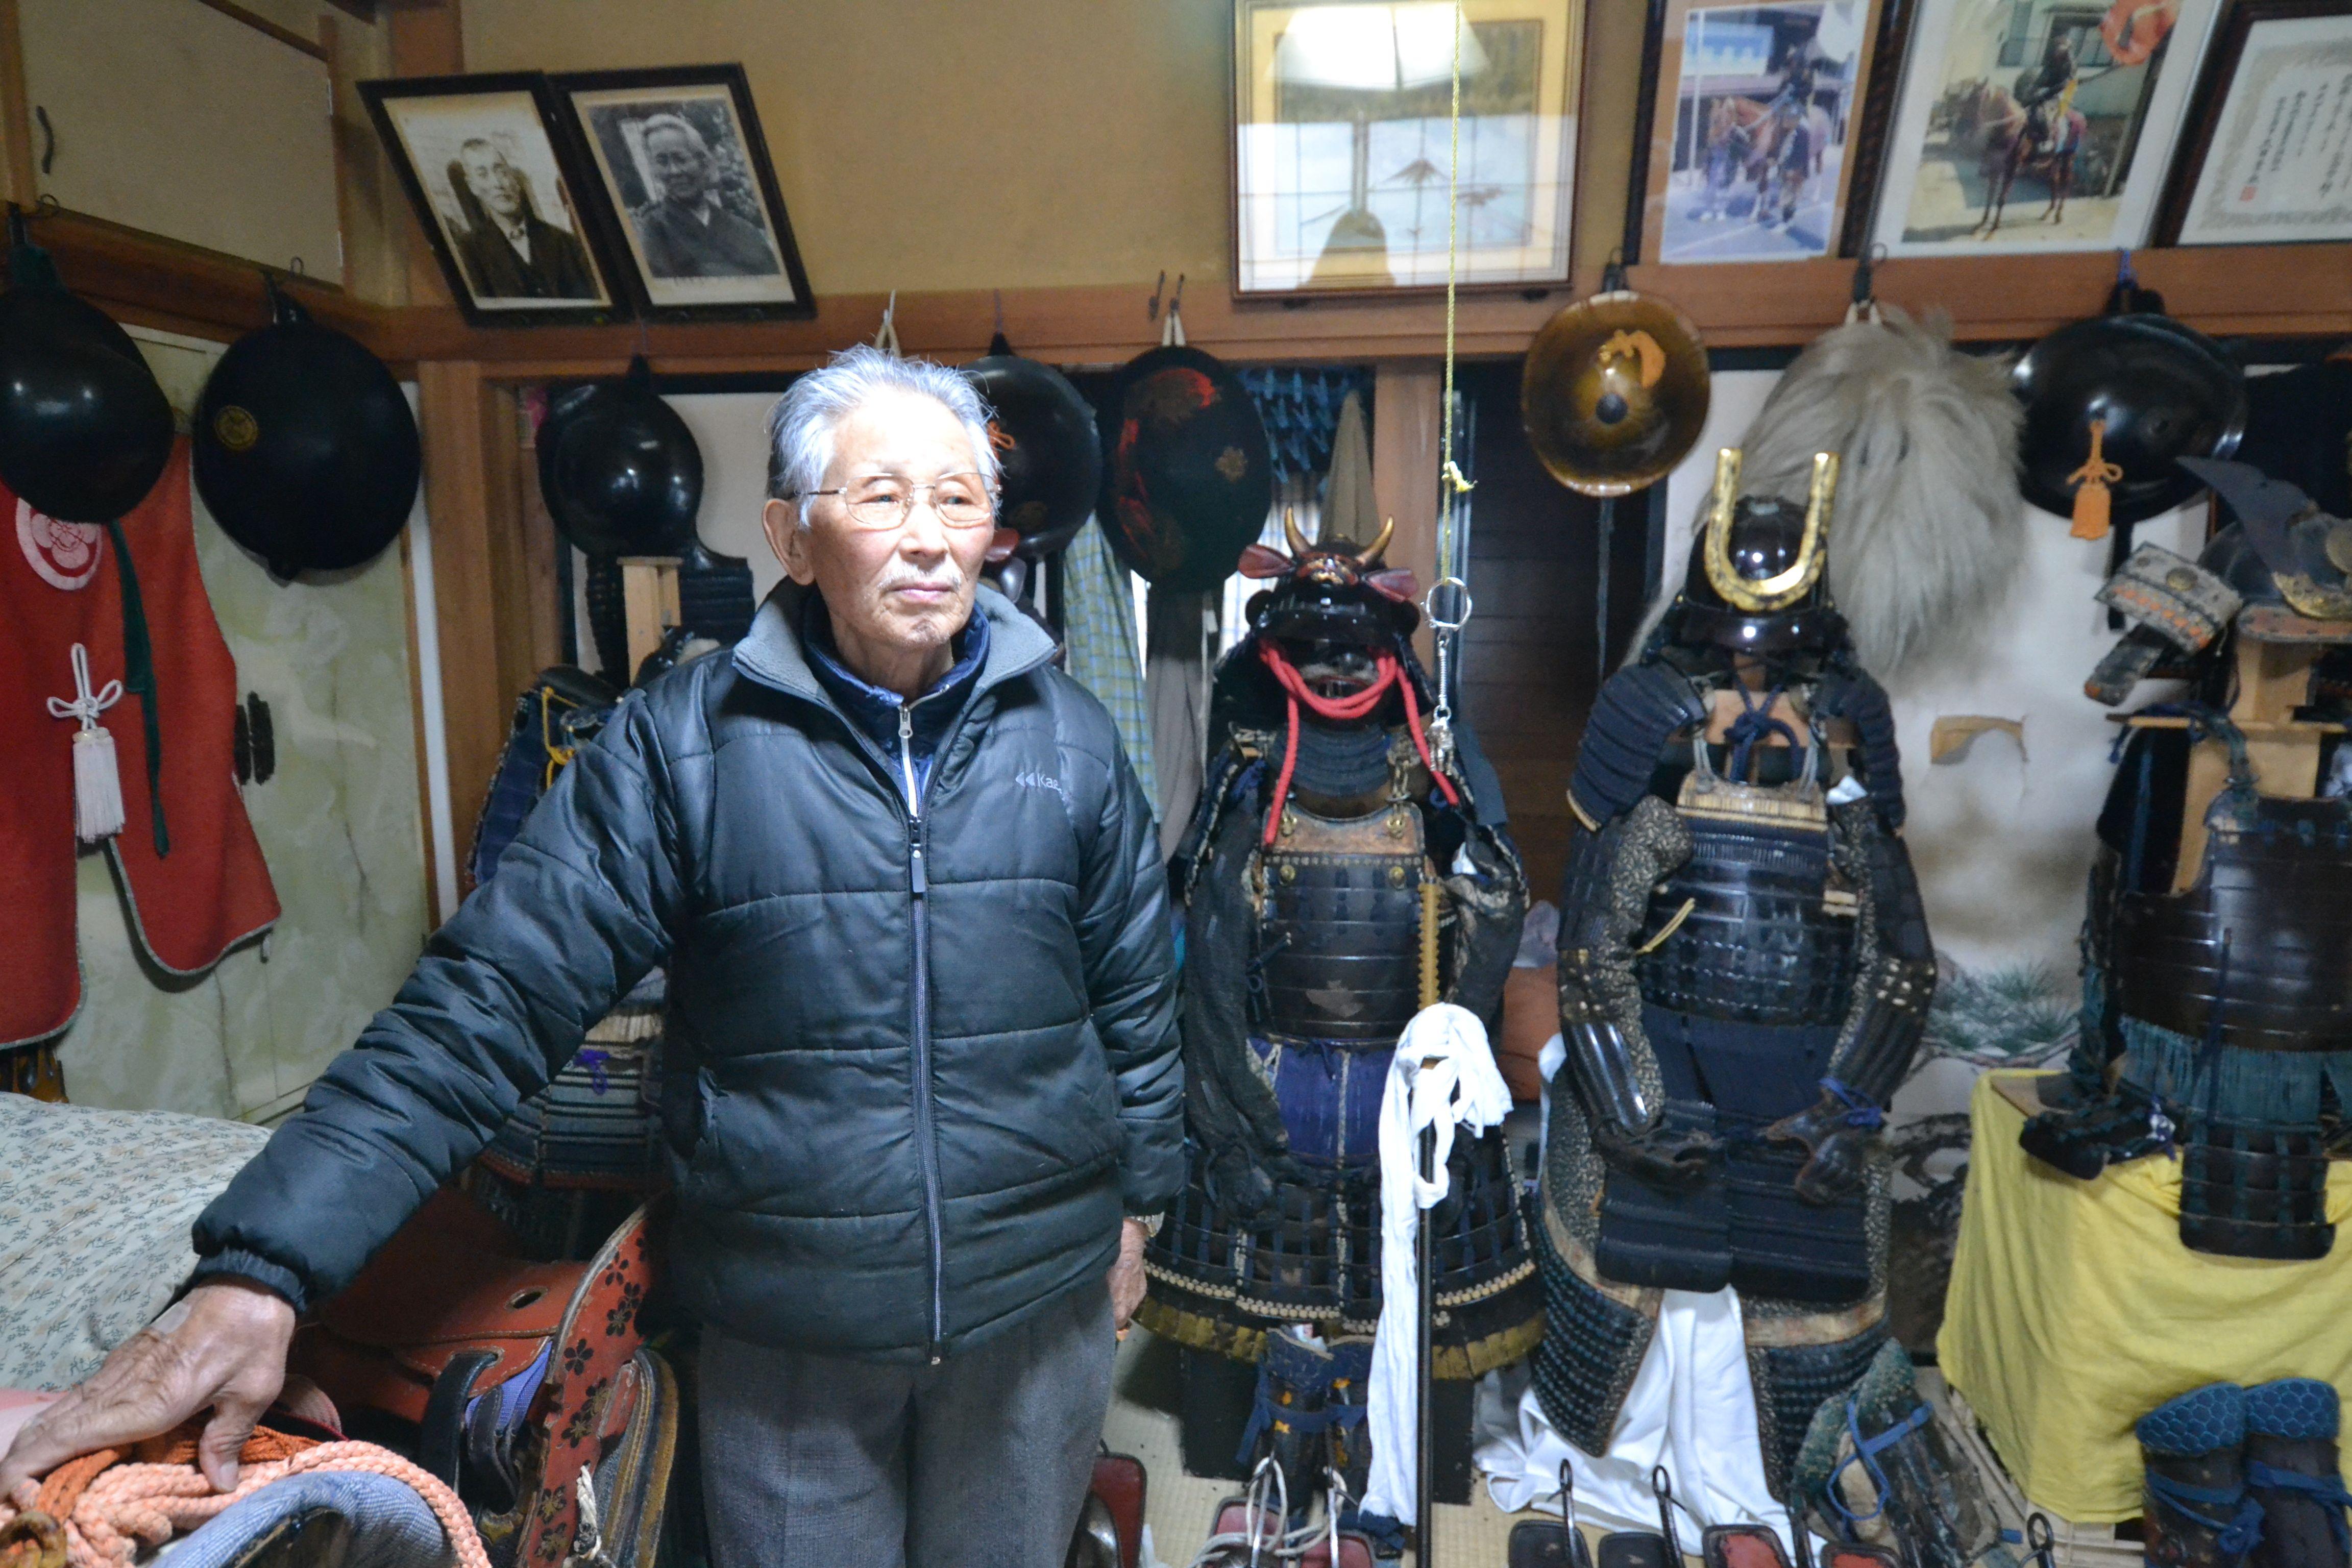 minamisoma samurai at home with samurai spirits.jpg